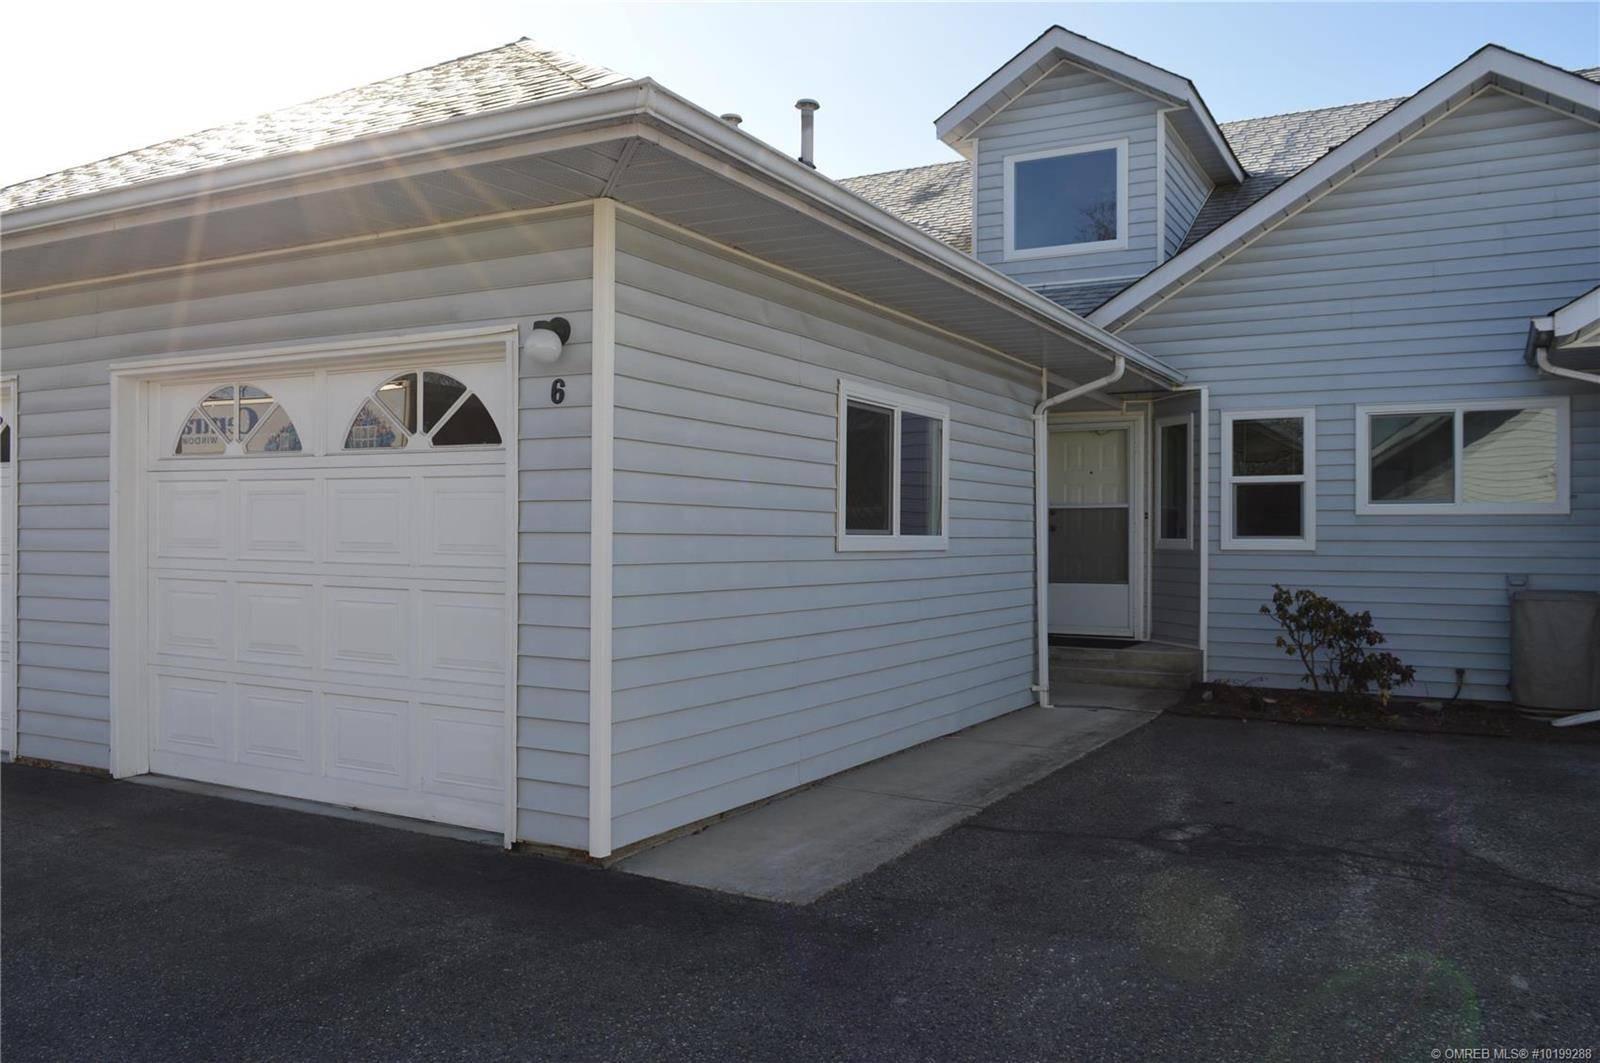 Townhouse for sale at 350 Davie Rd Unit 6 Kelowna British Columbia - MLS: 10199288